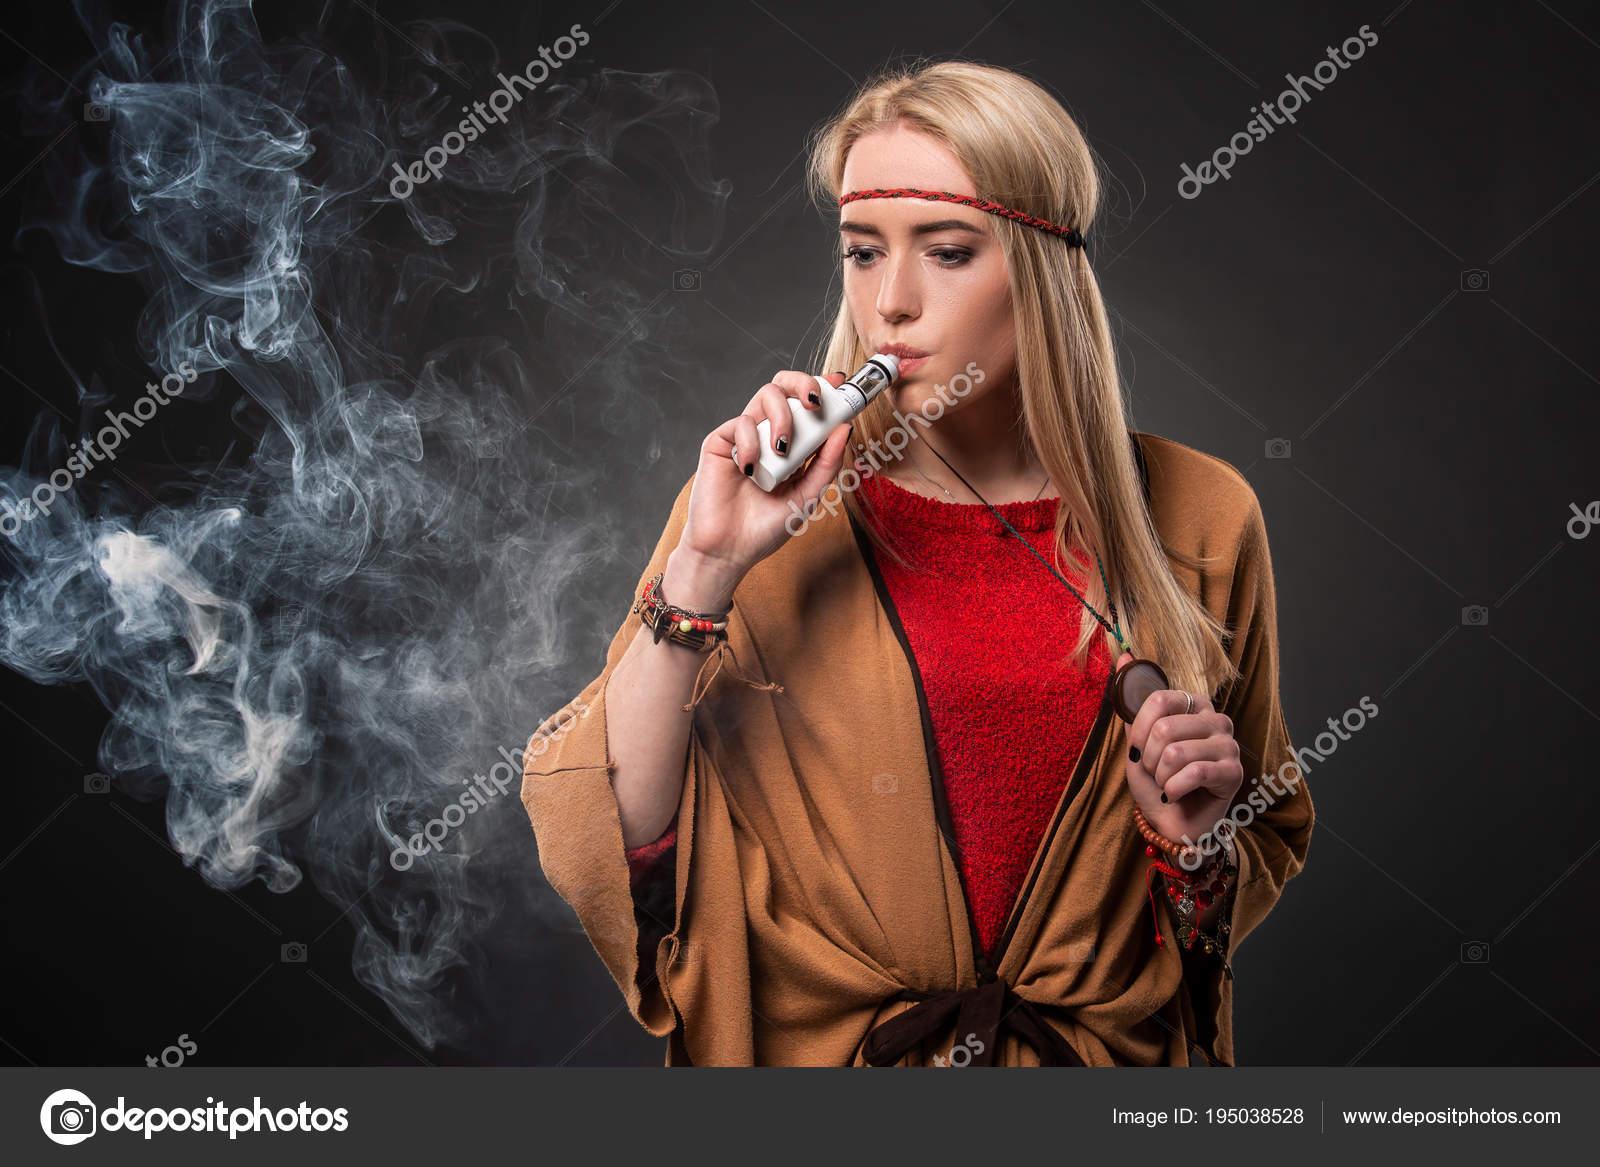 indin έφηβος πορνό